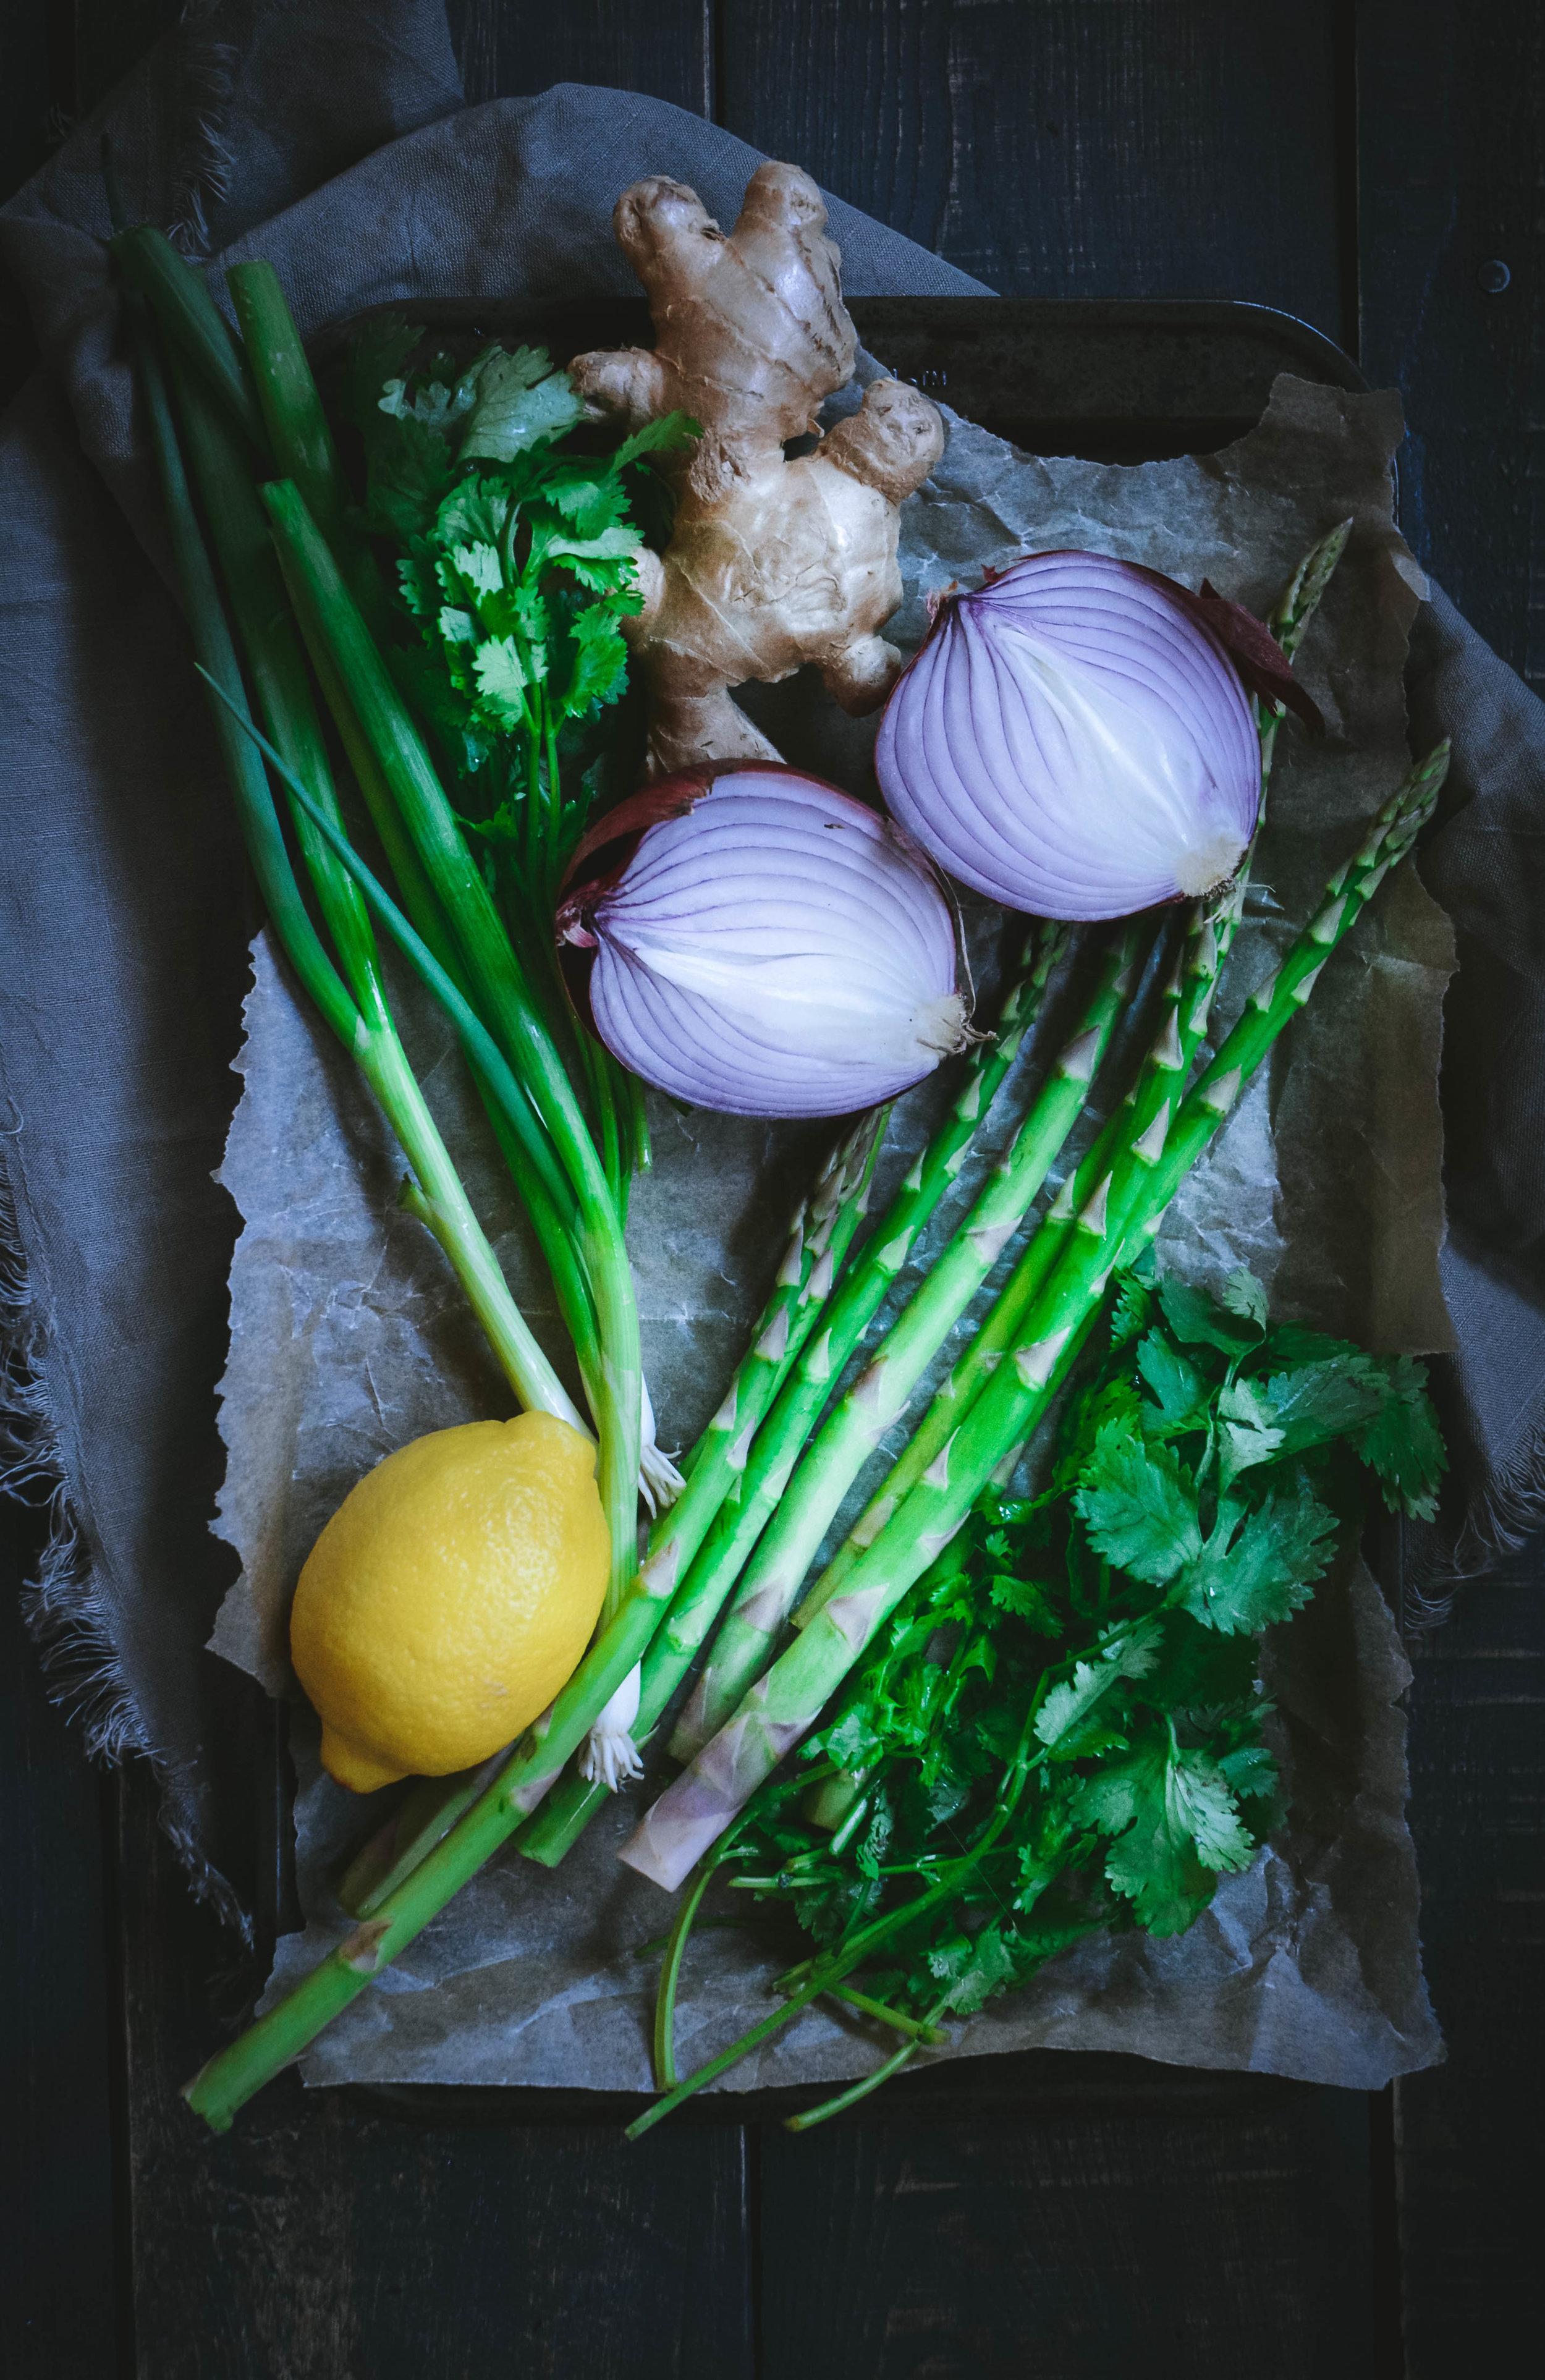 lemon, ginger, asparagus, green onion, cilantro on roasting tray